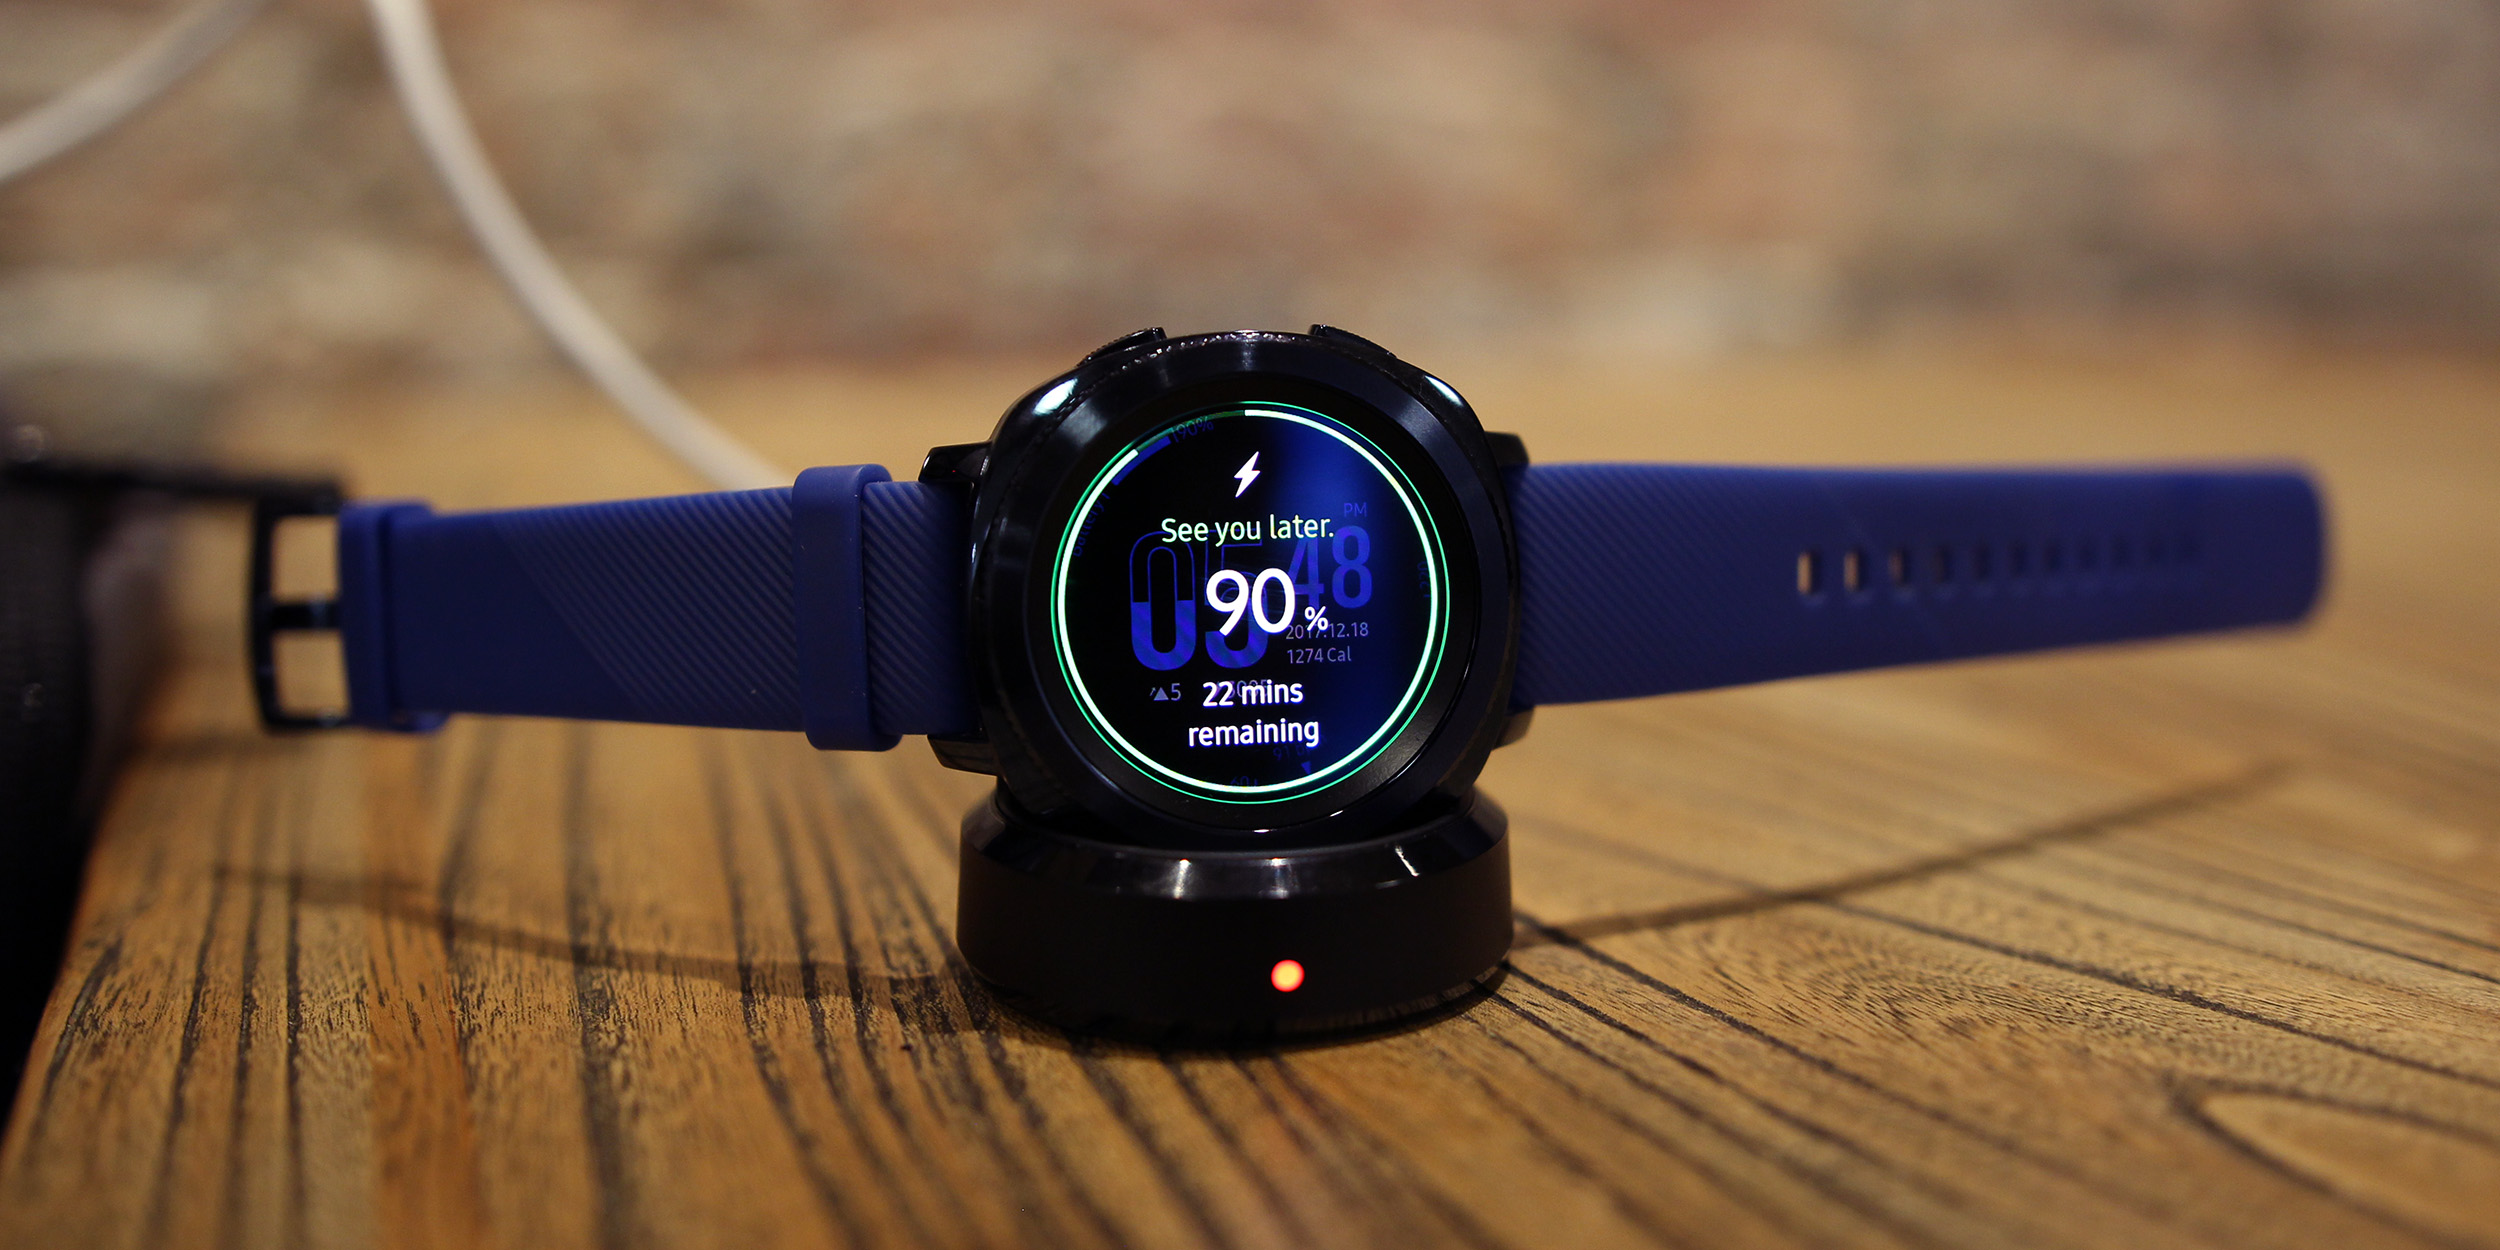 9to5Toys Mittagspause: Samsung Gear Sport $ 160, SanDisk 400 GB microSD-Karte $ 130, VIZIO 65 ″ 4K HDR Smart UHDTV $ 1.400, mehr